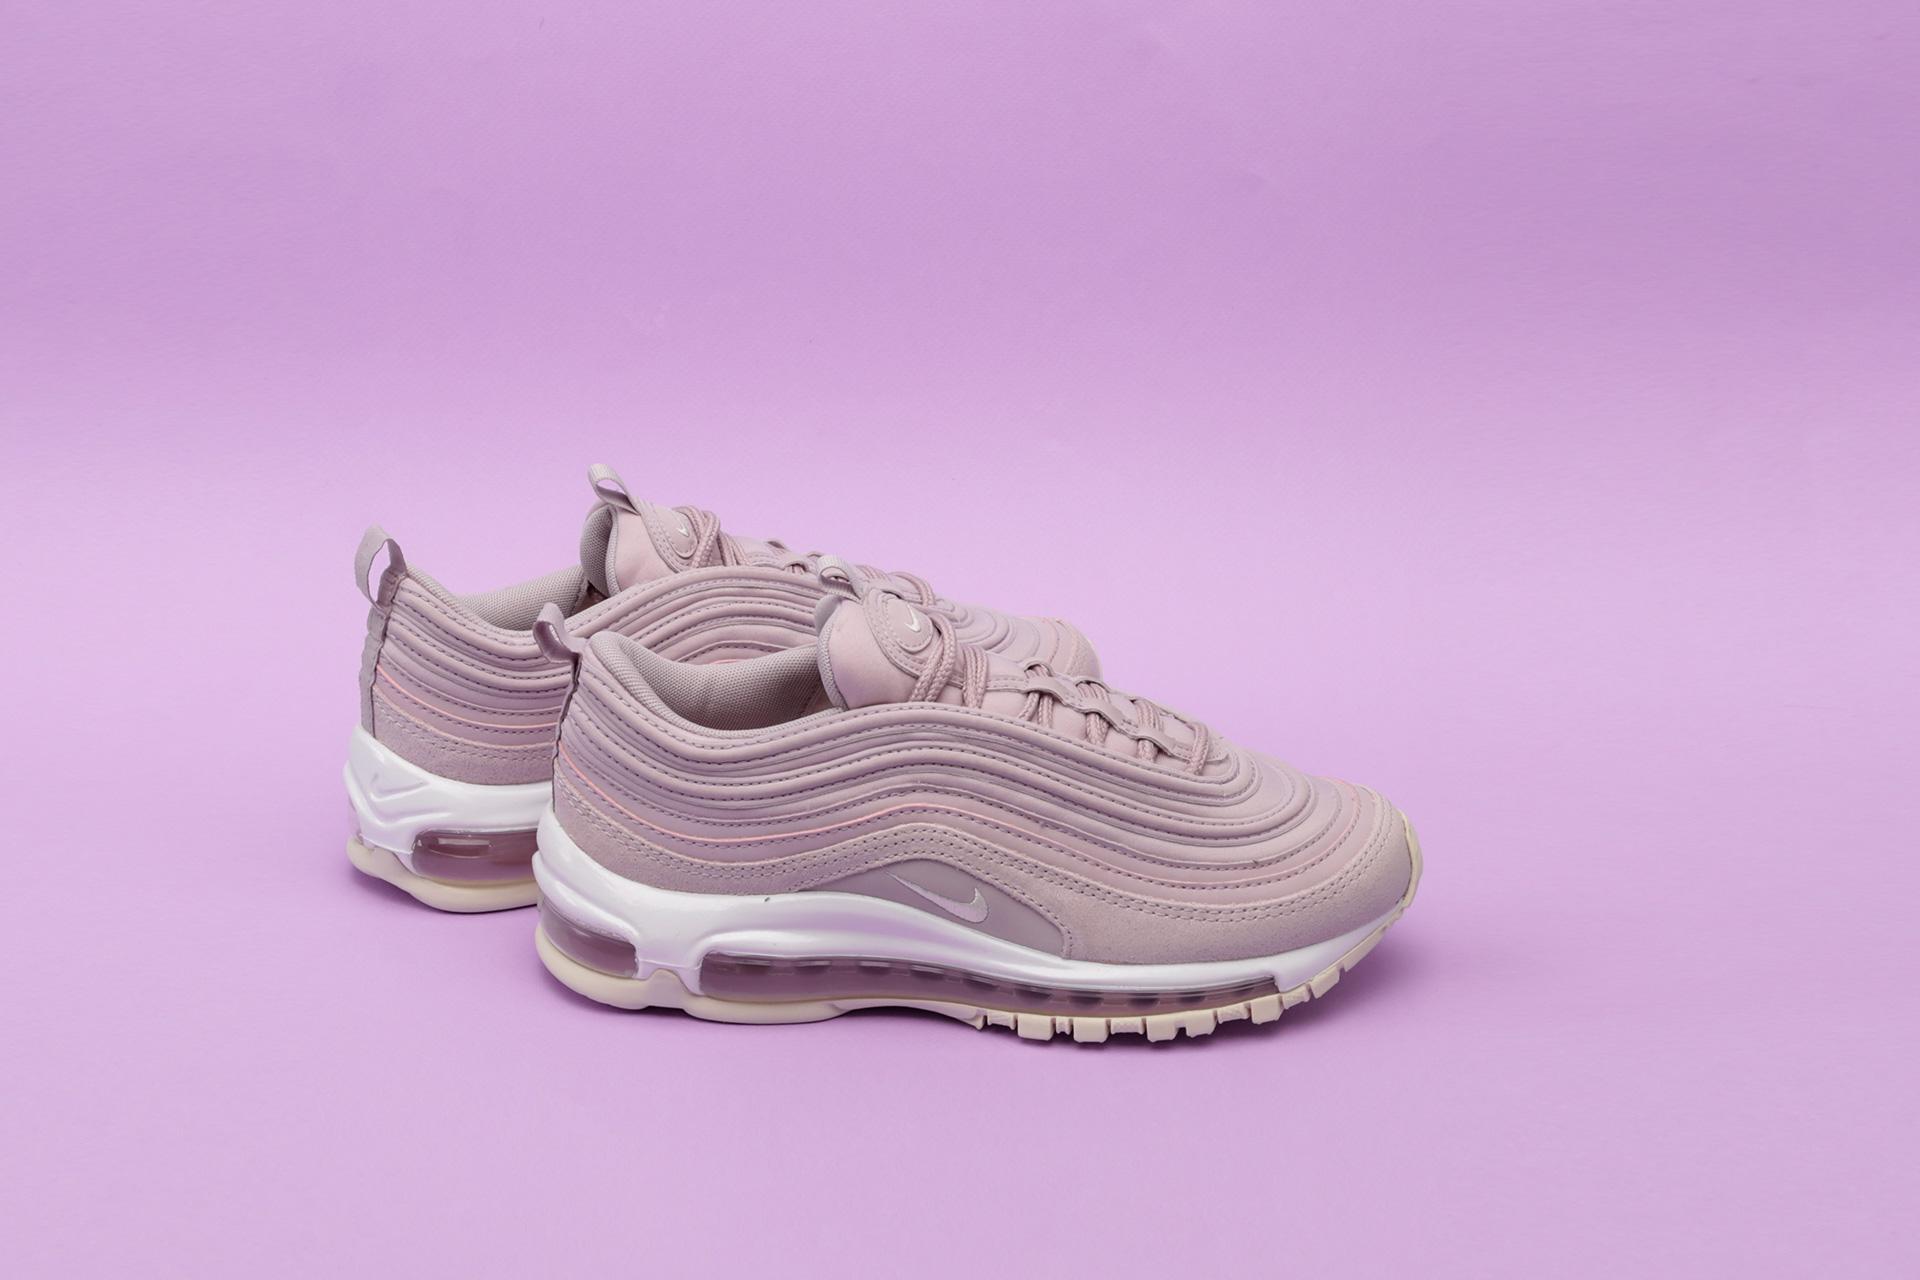 d99e1f72 Купить розовые женские кроссовки W Air Max 97 PRM от Nike (917646 ...